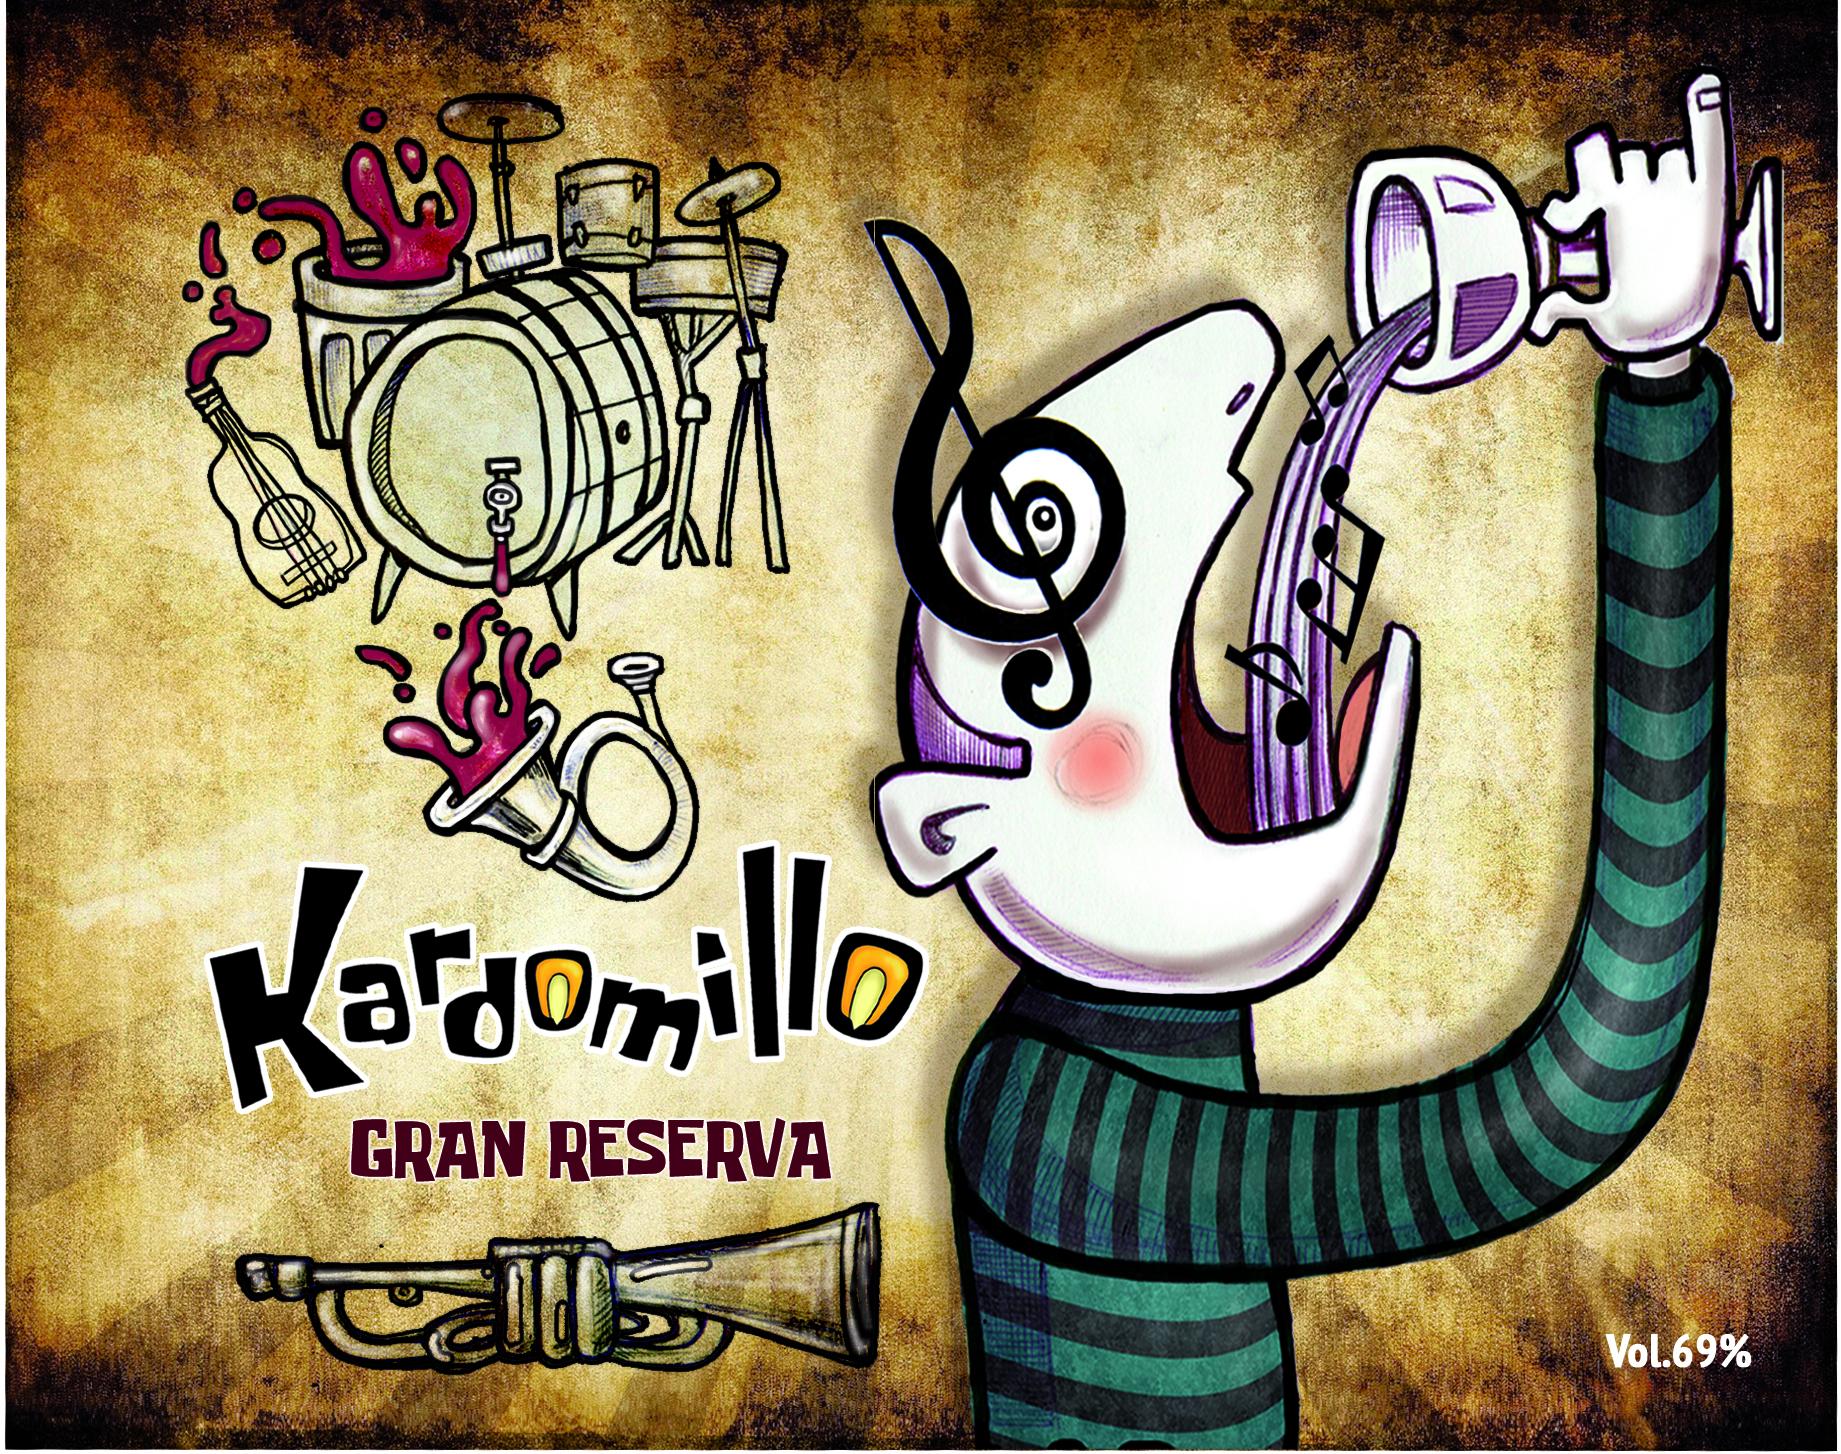 Kardomillo saca nuevo disco, Gran Reserva